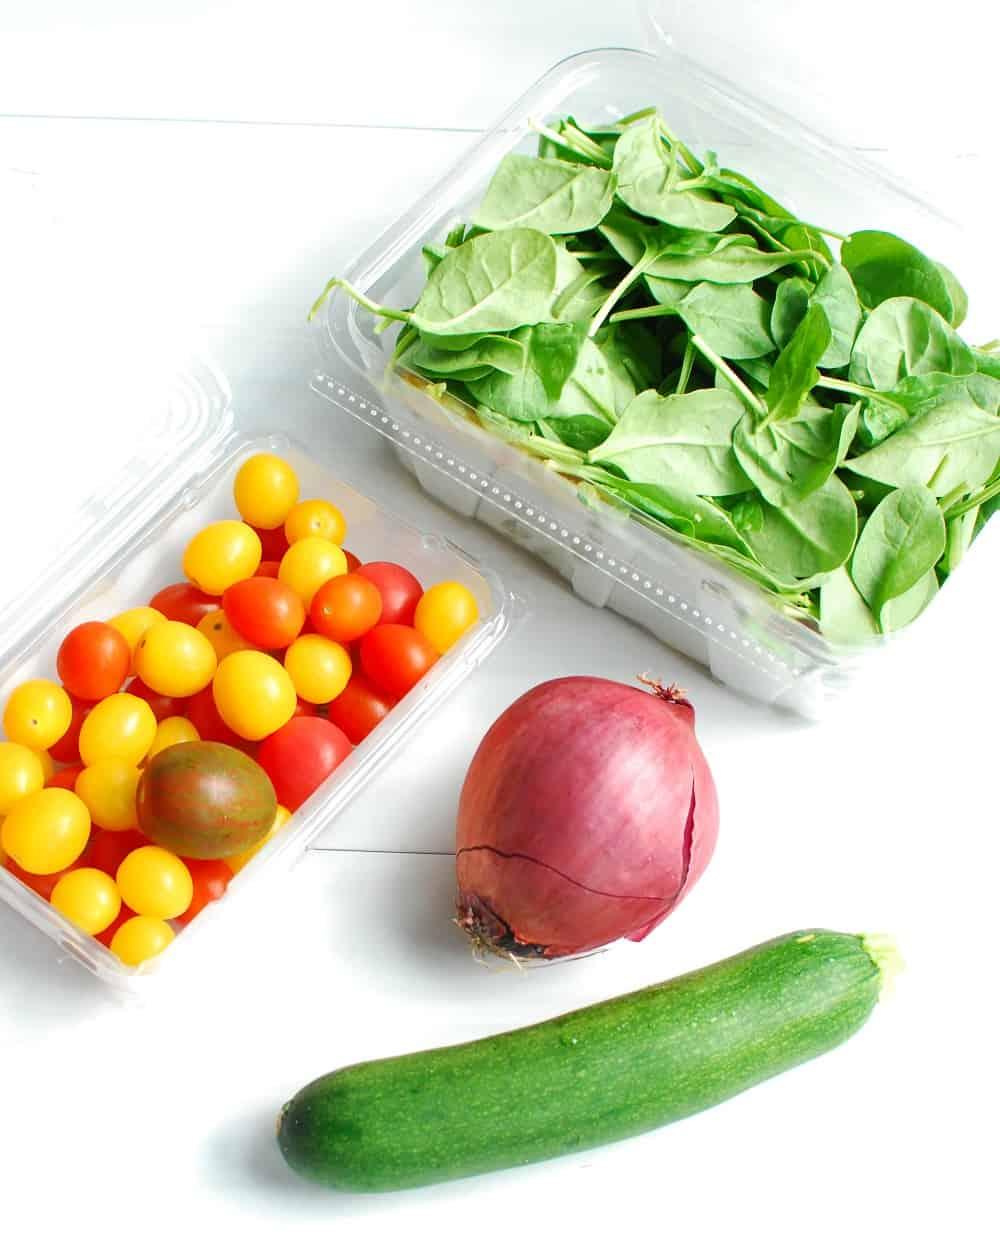 A variety of garden vegetables